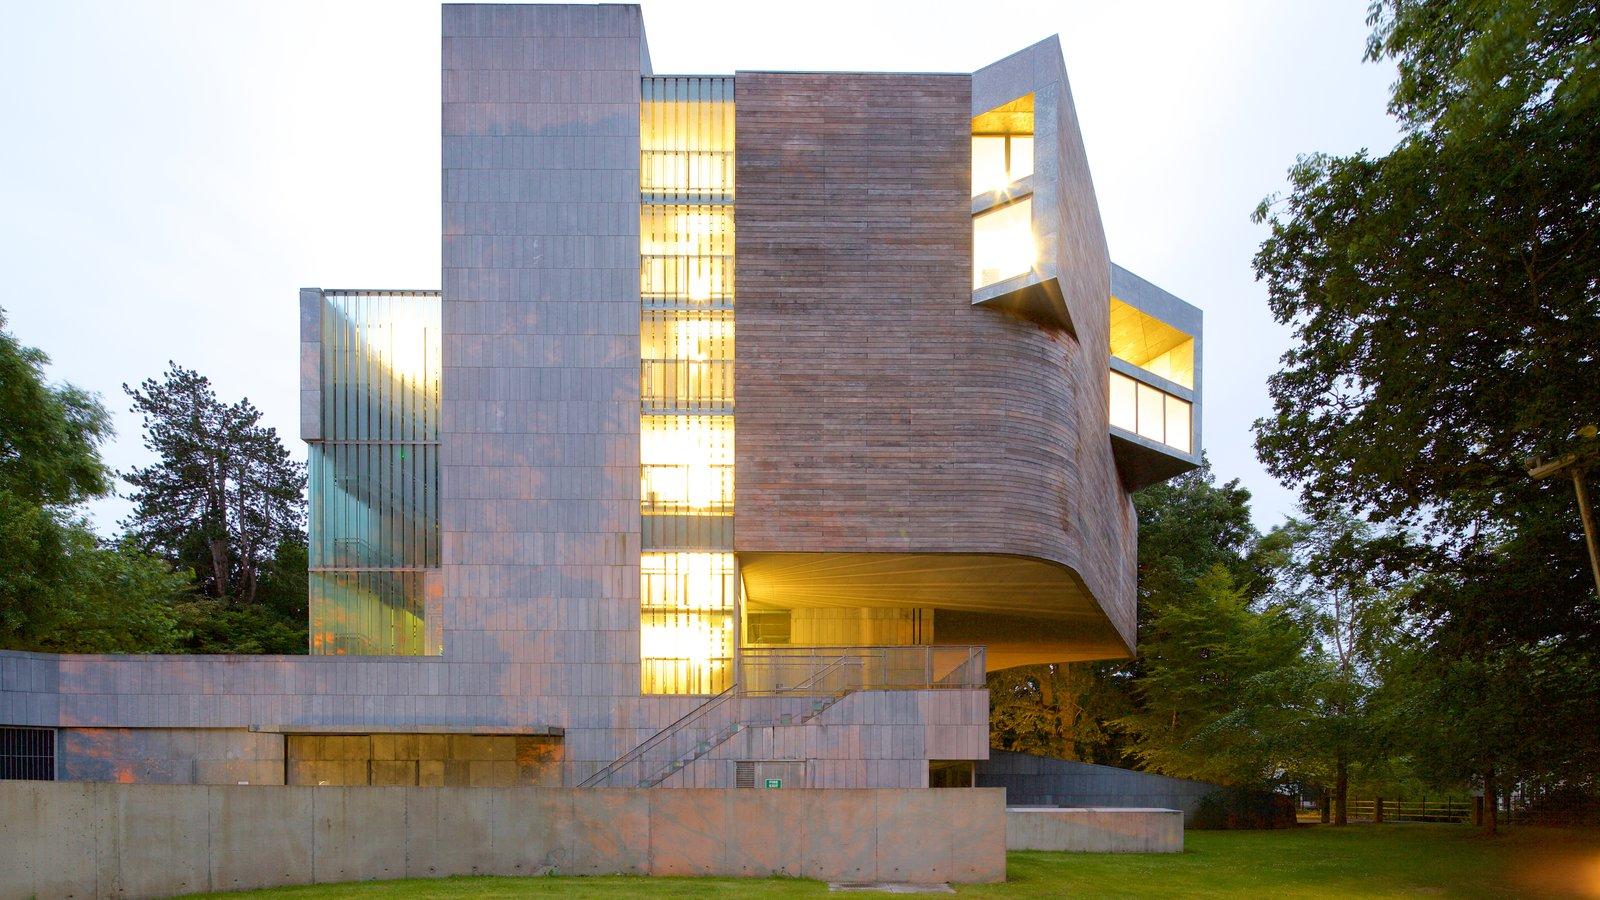 Glucksman Gallery mostrando arquitectura moderna